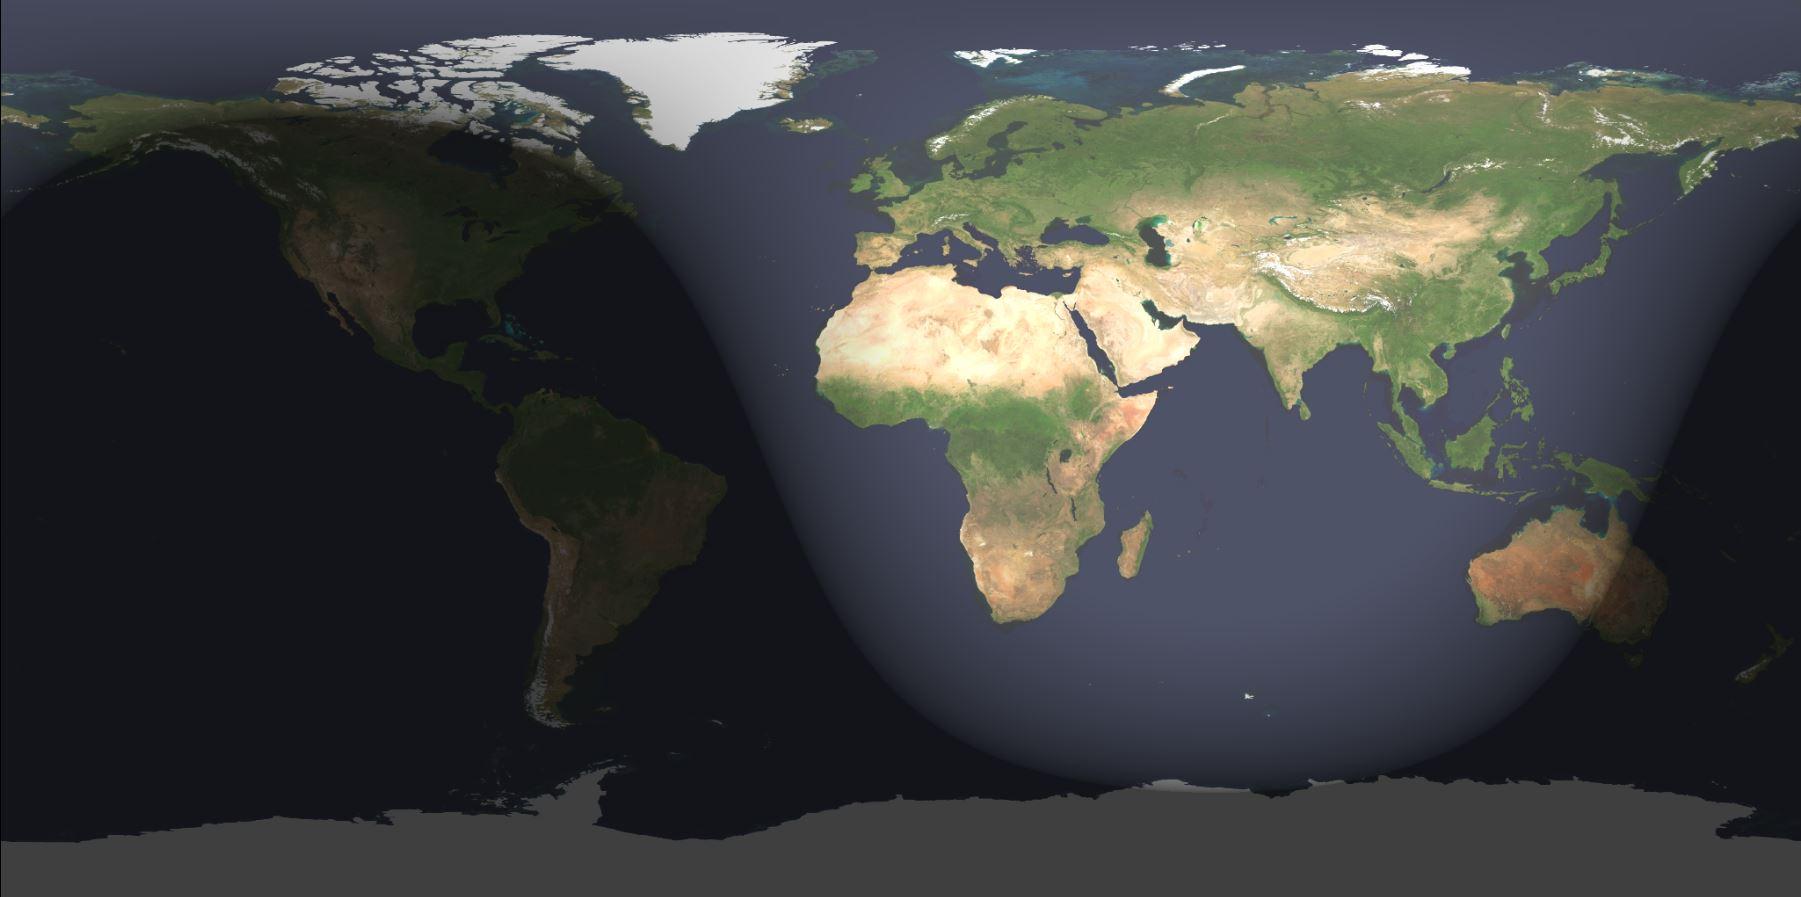 Image Source: U.S. Naval Observatory